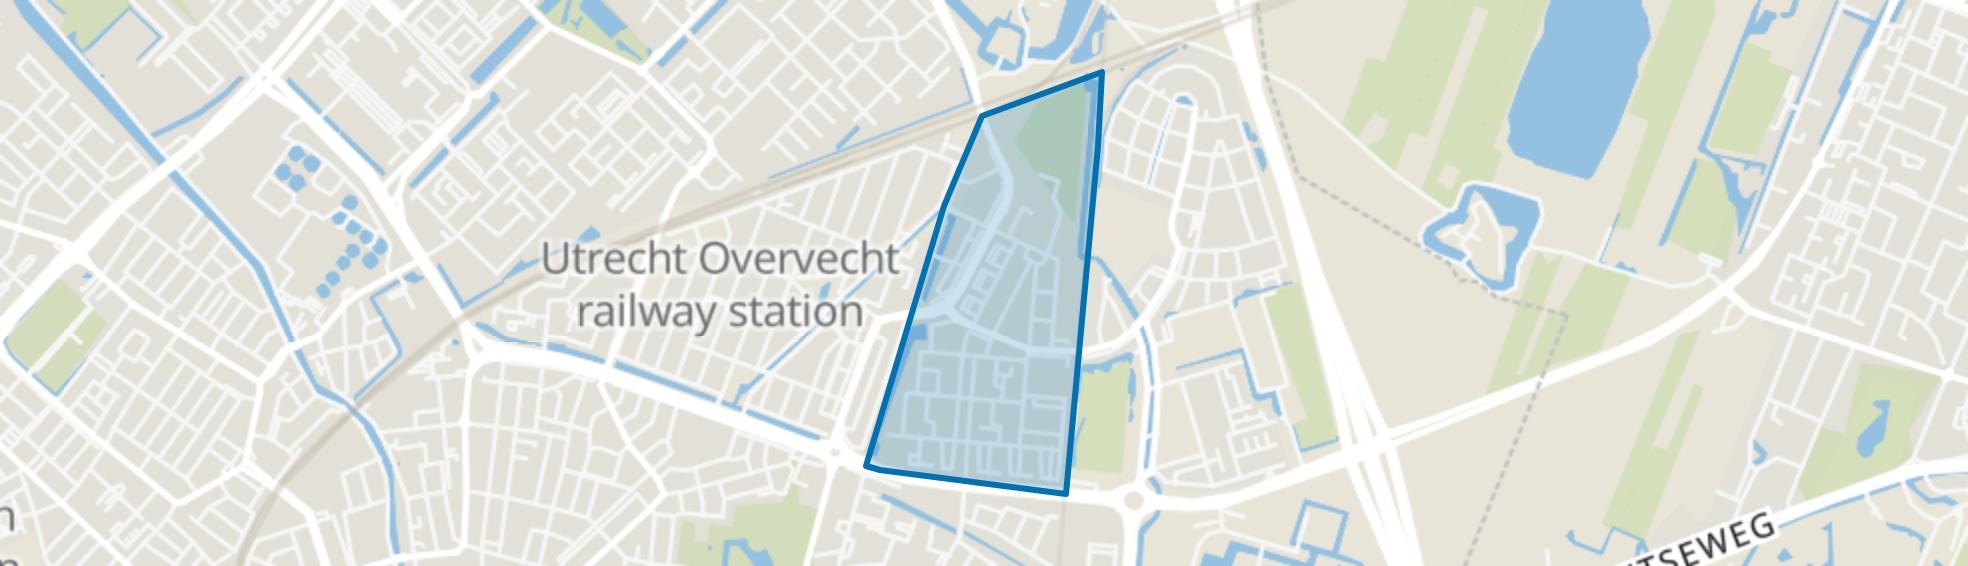 Tuindorp-Oost, Utrecht map